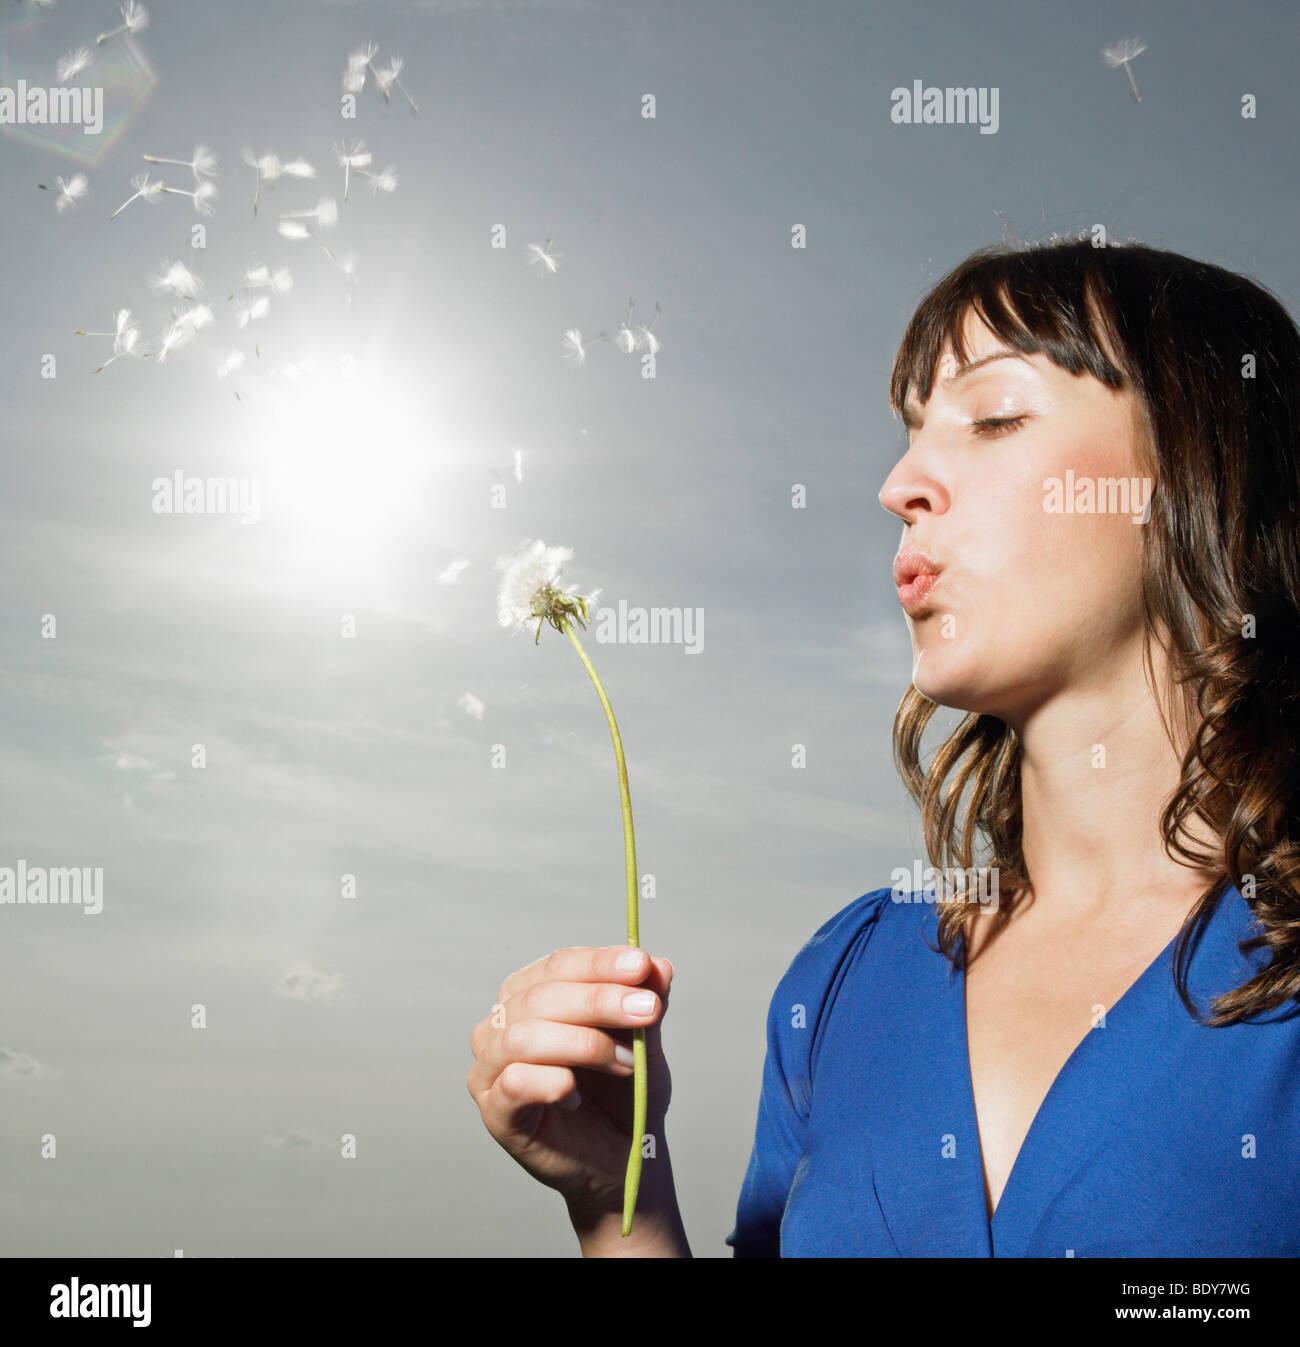 Woman blowing dandelion Stock Photo